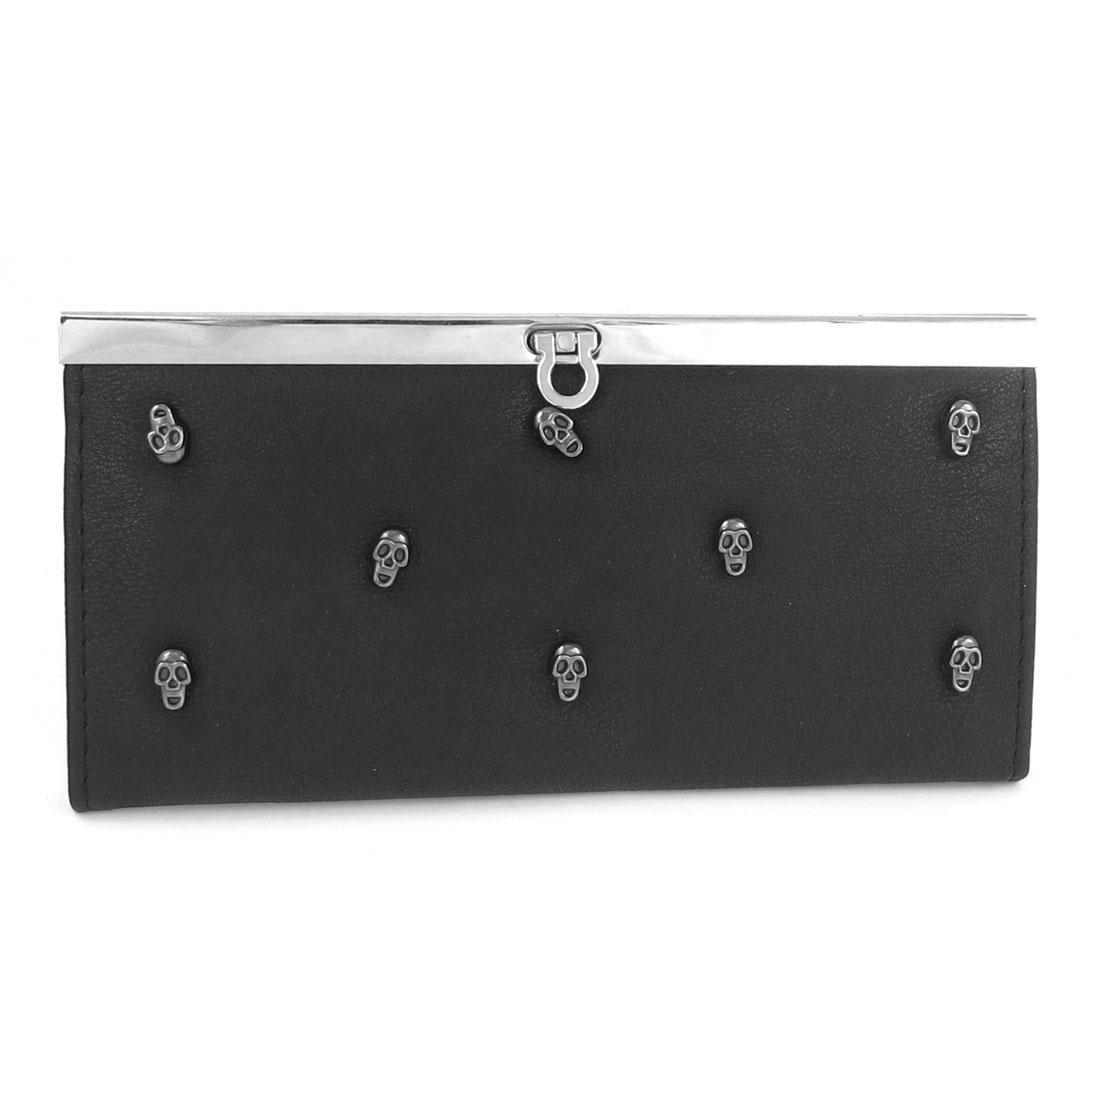 Lady Faux Leather Skull Decor 4 Compartment Flip Lock Closure Purse Black